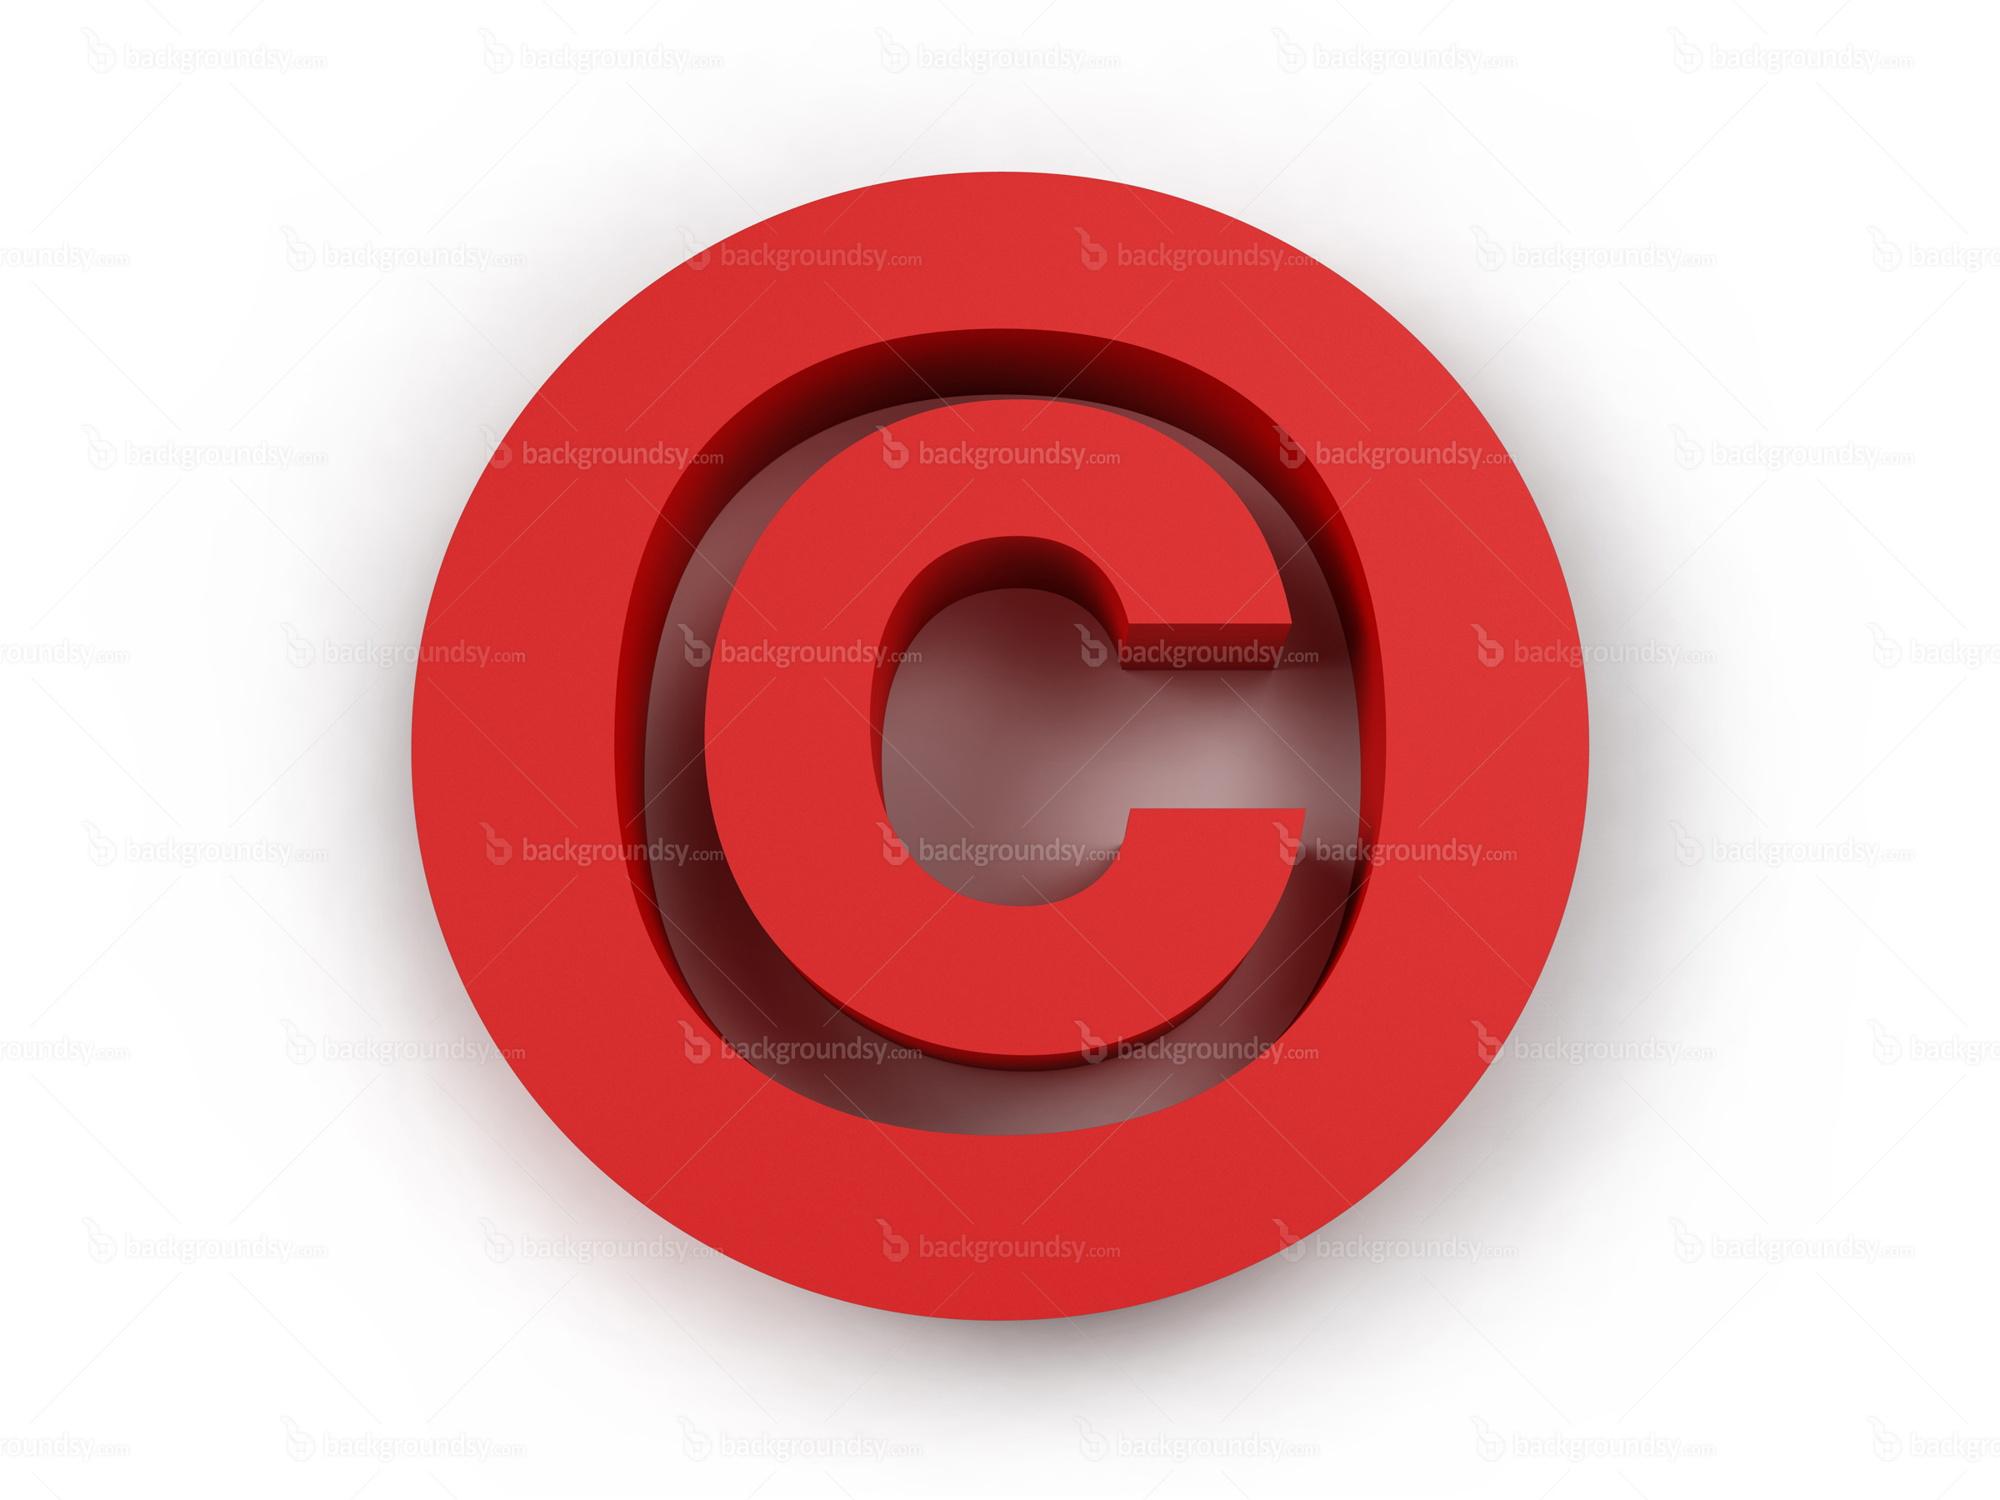 Copyright symbol backgroundsy copyright symbol biocorpaavc